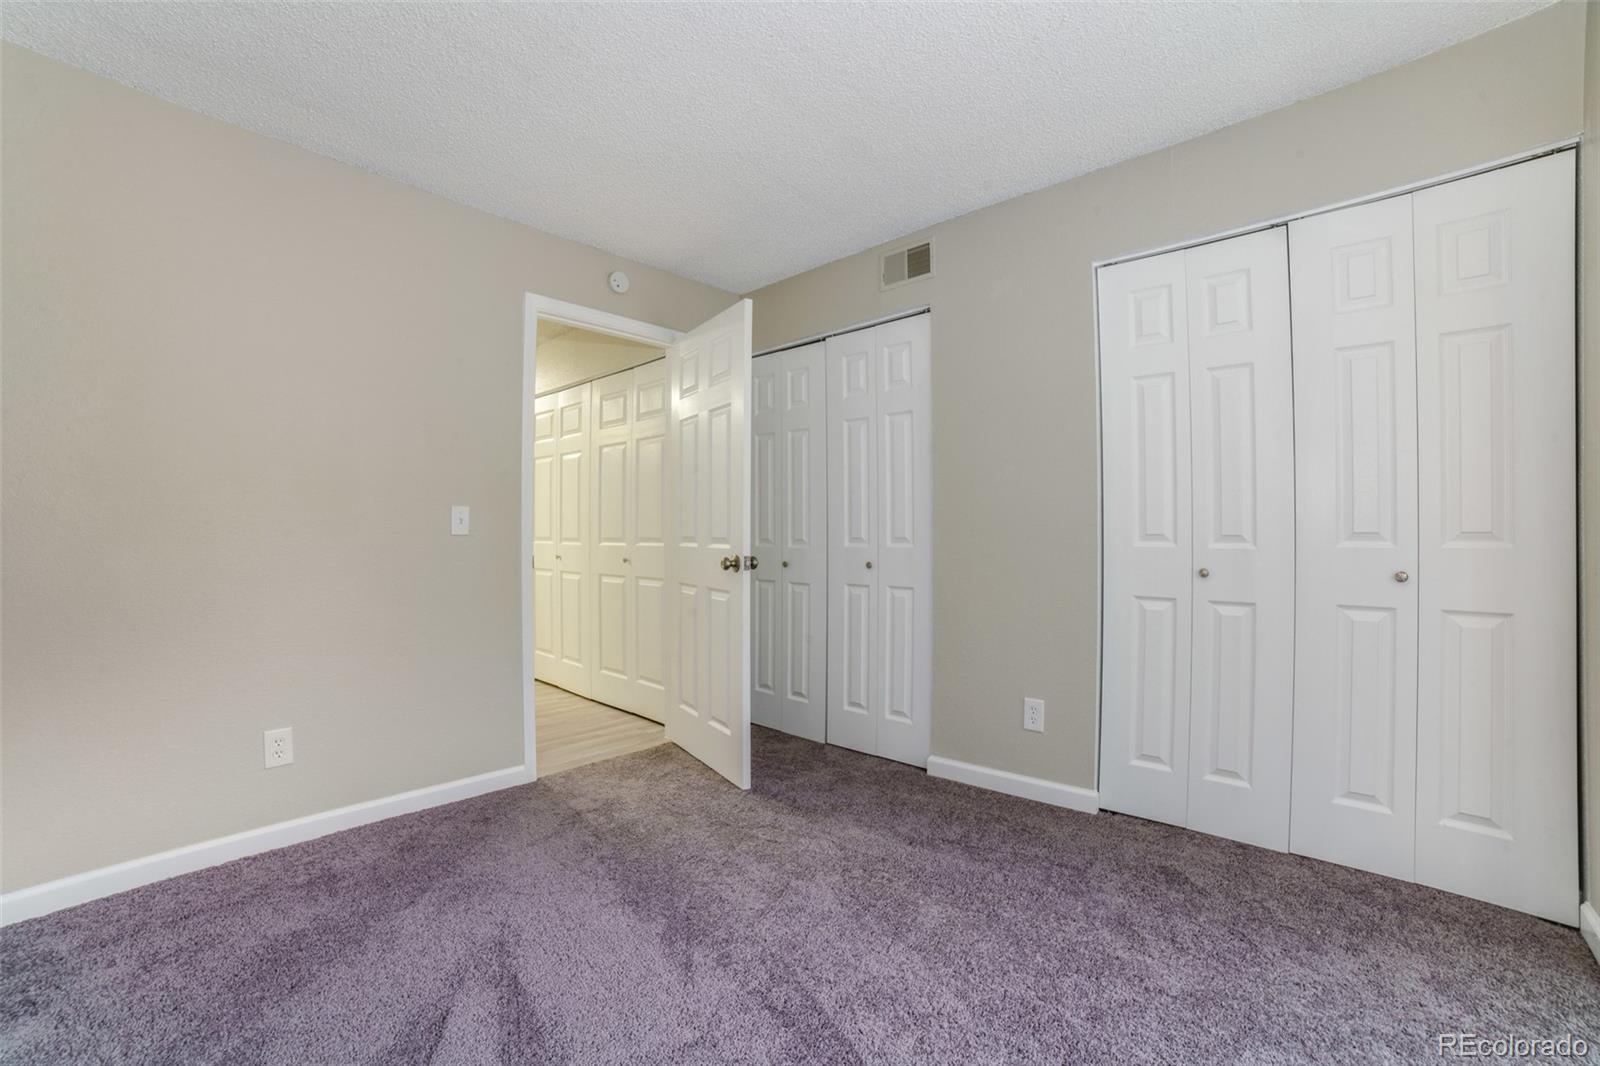 MLS# 8386467 - 18 - 220 Wright Street #203, Lakewood, CO 80228